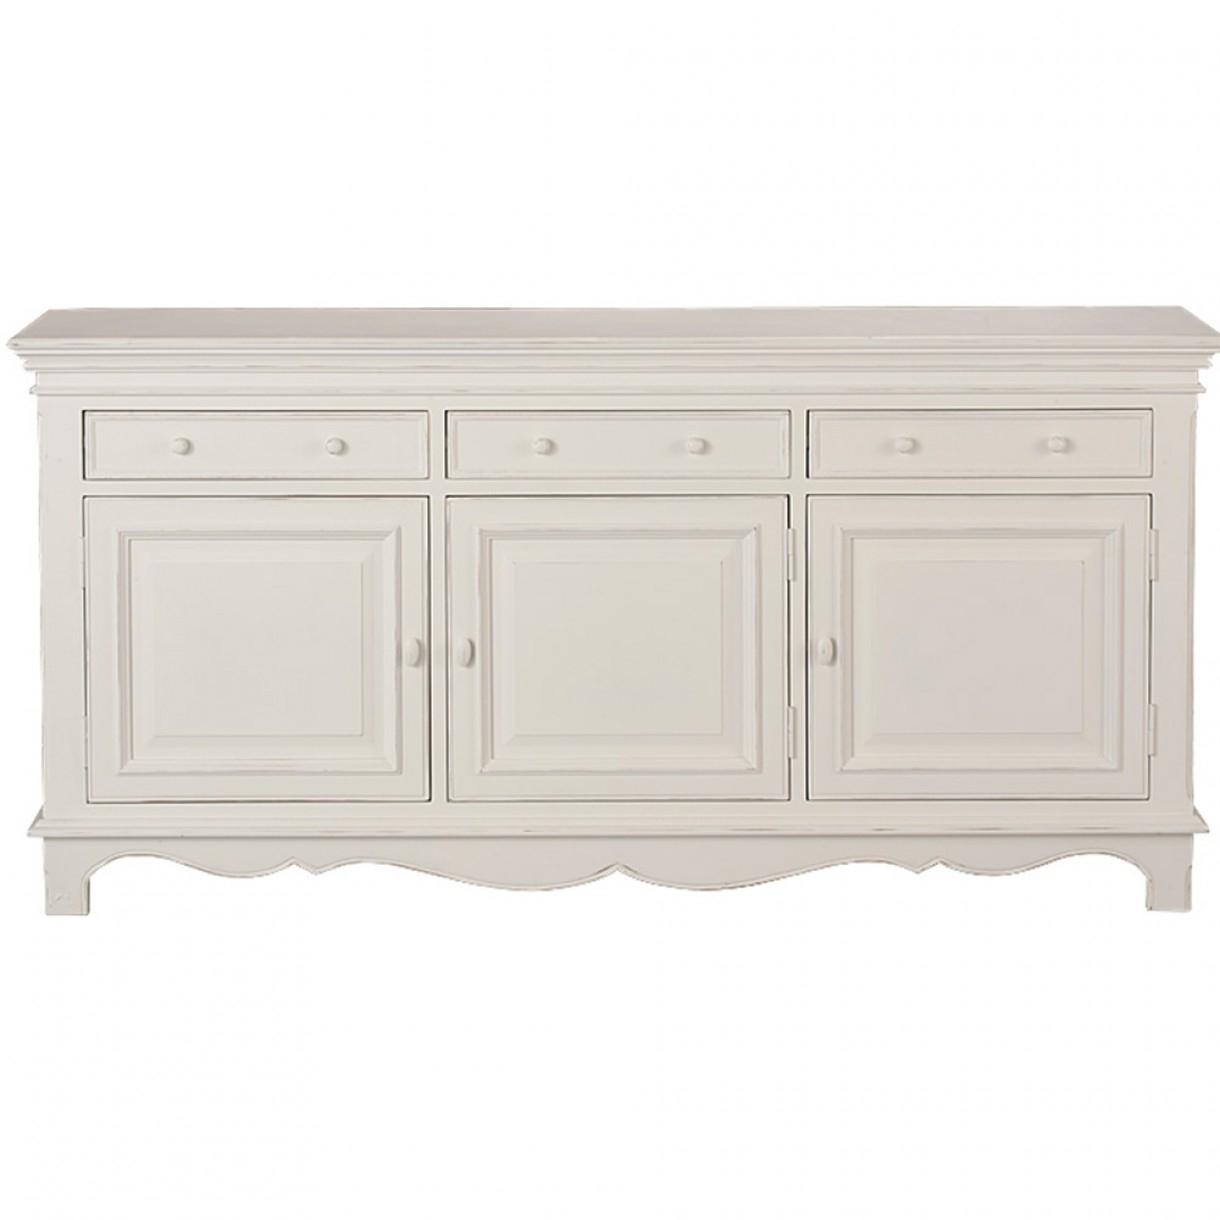 Harmonie 3 Door Sideboard Inside Most Up To Date White Wash 3 Door 3 Drawer Sideboards (View 13 of 20)